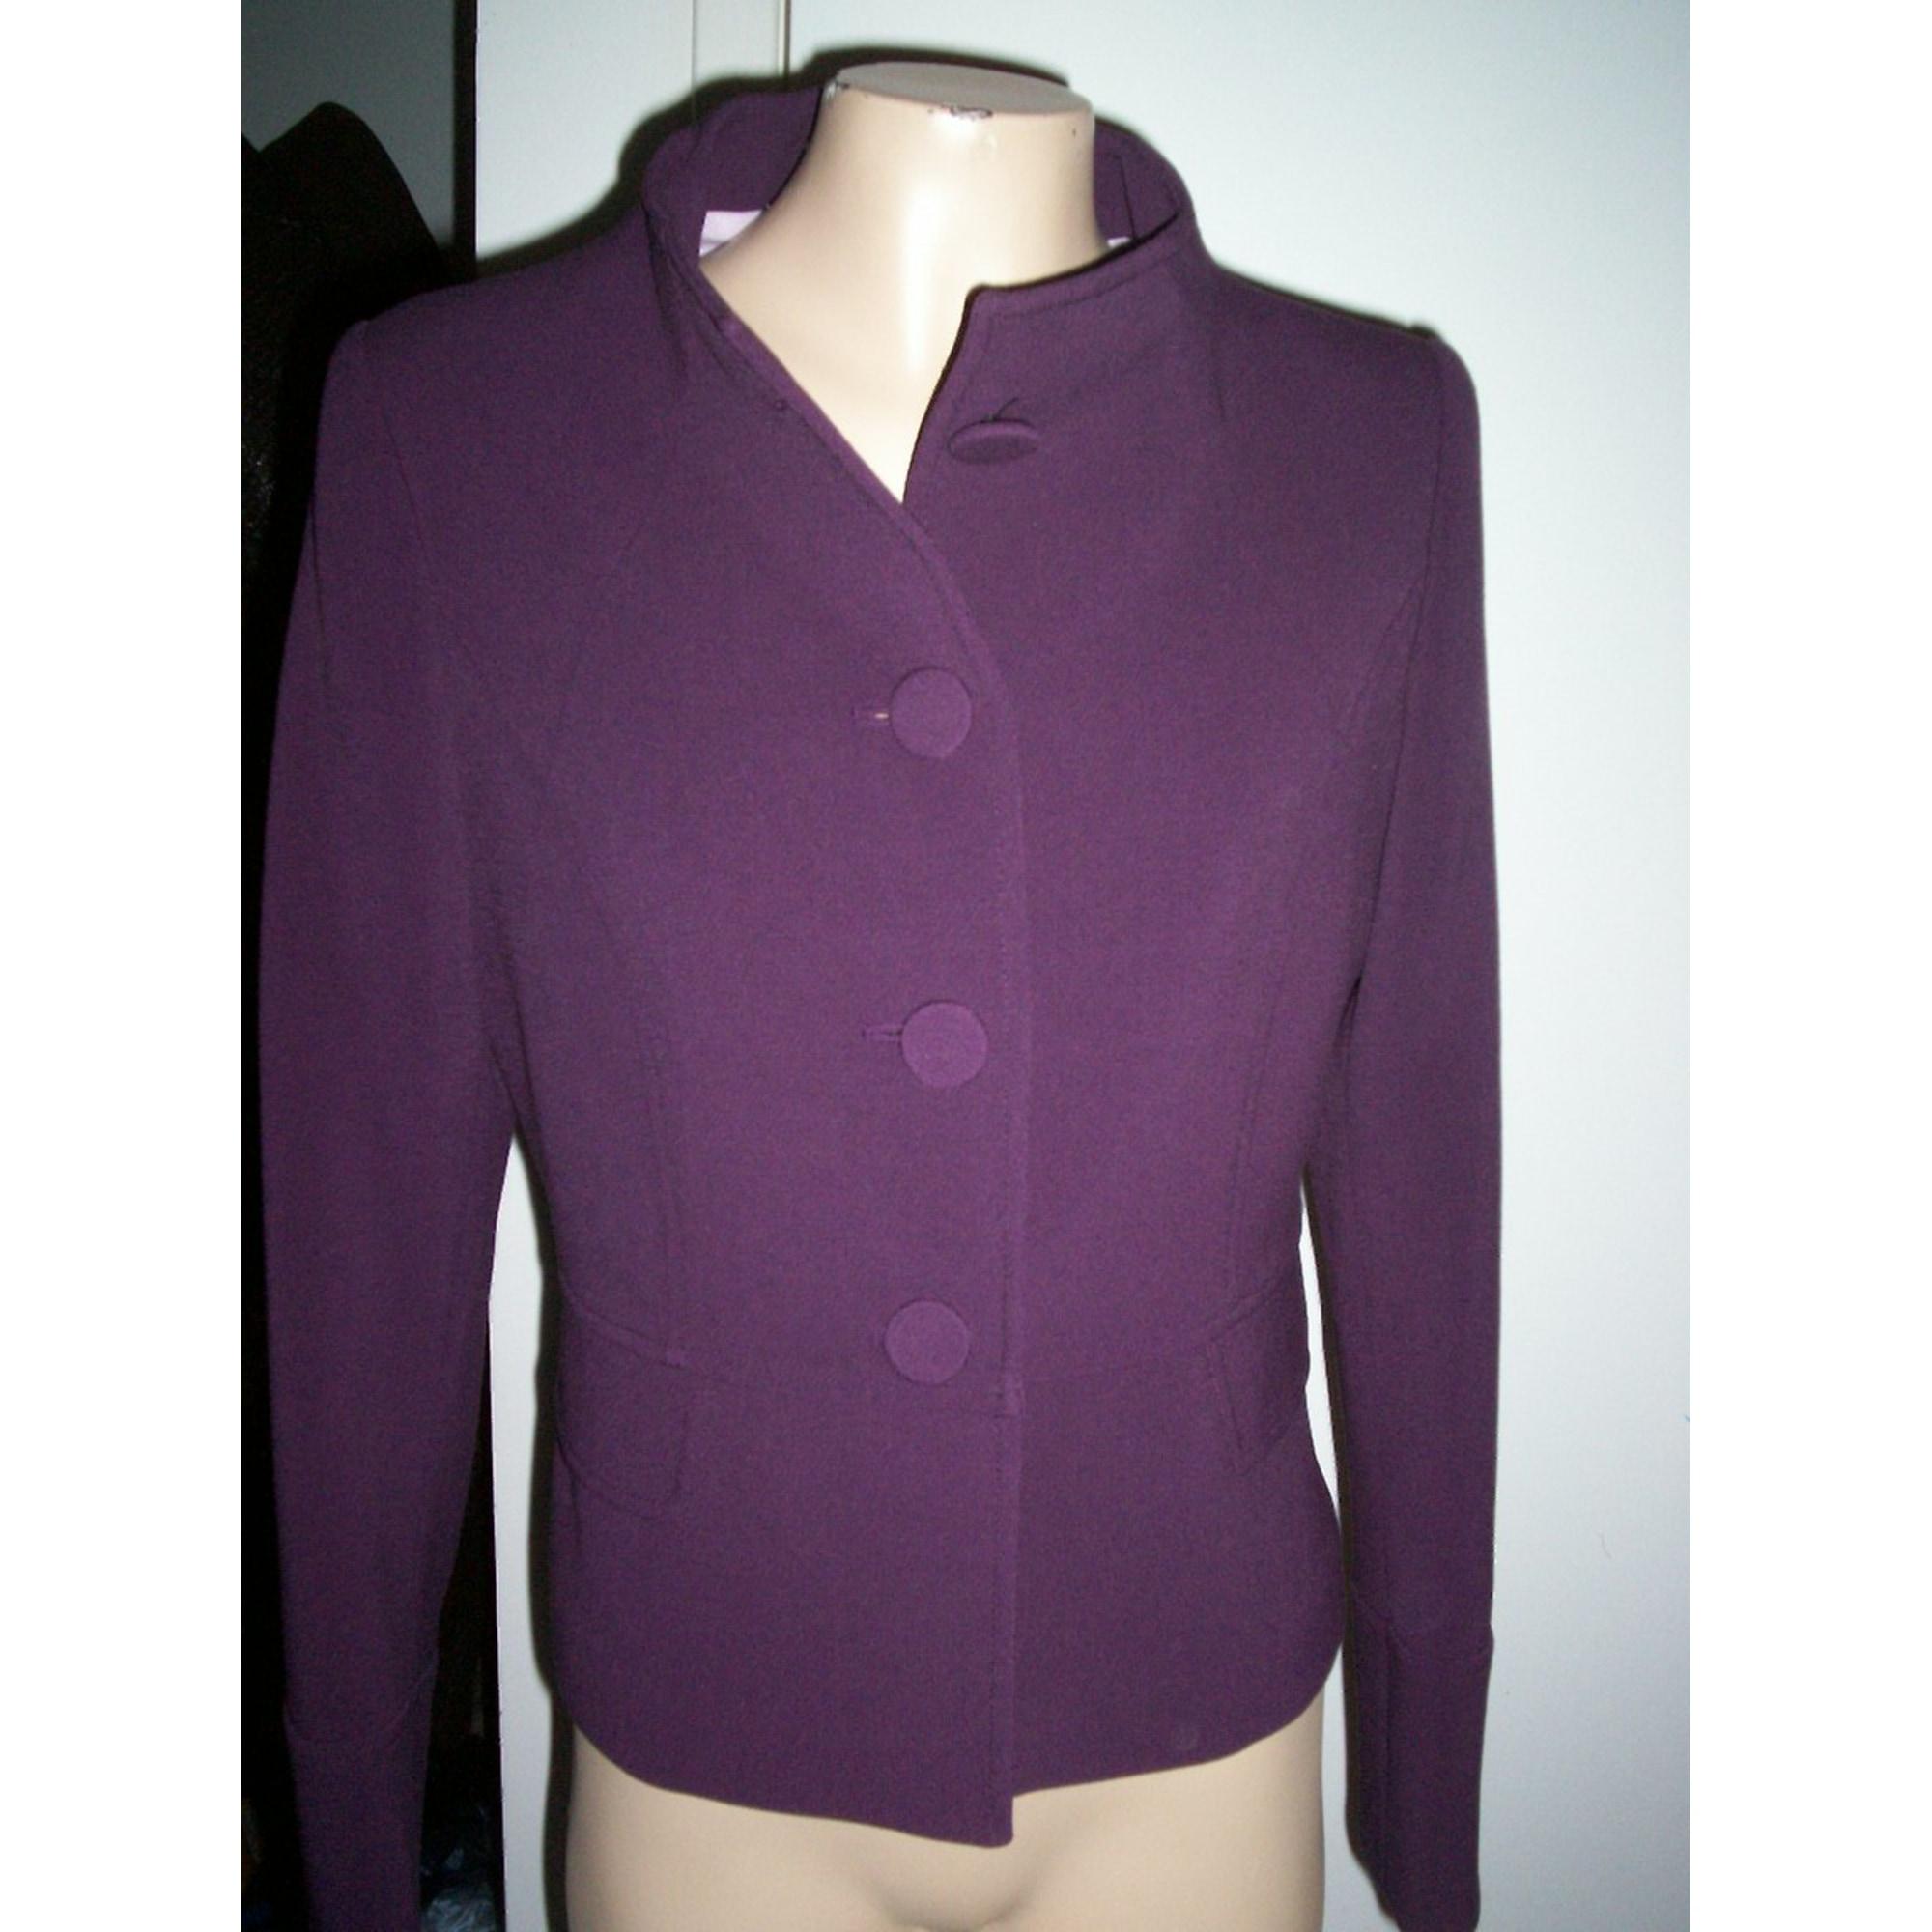 Blazer, veste tailleur CAROLL Violet, mauve, lavande